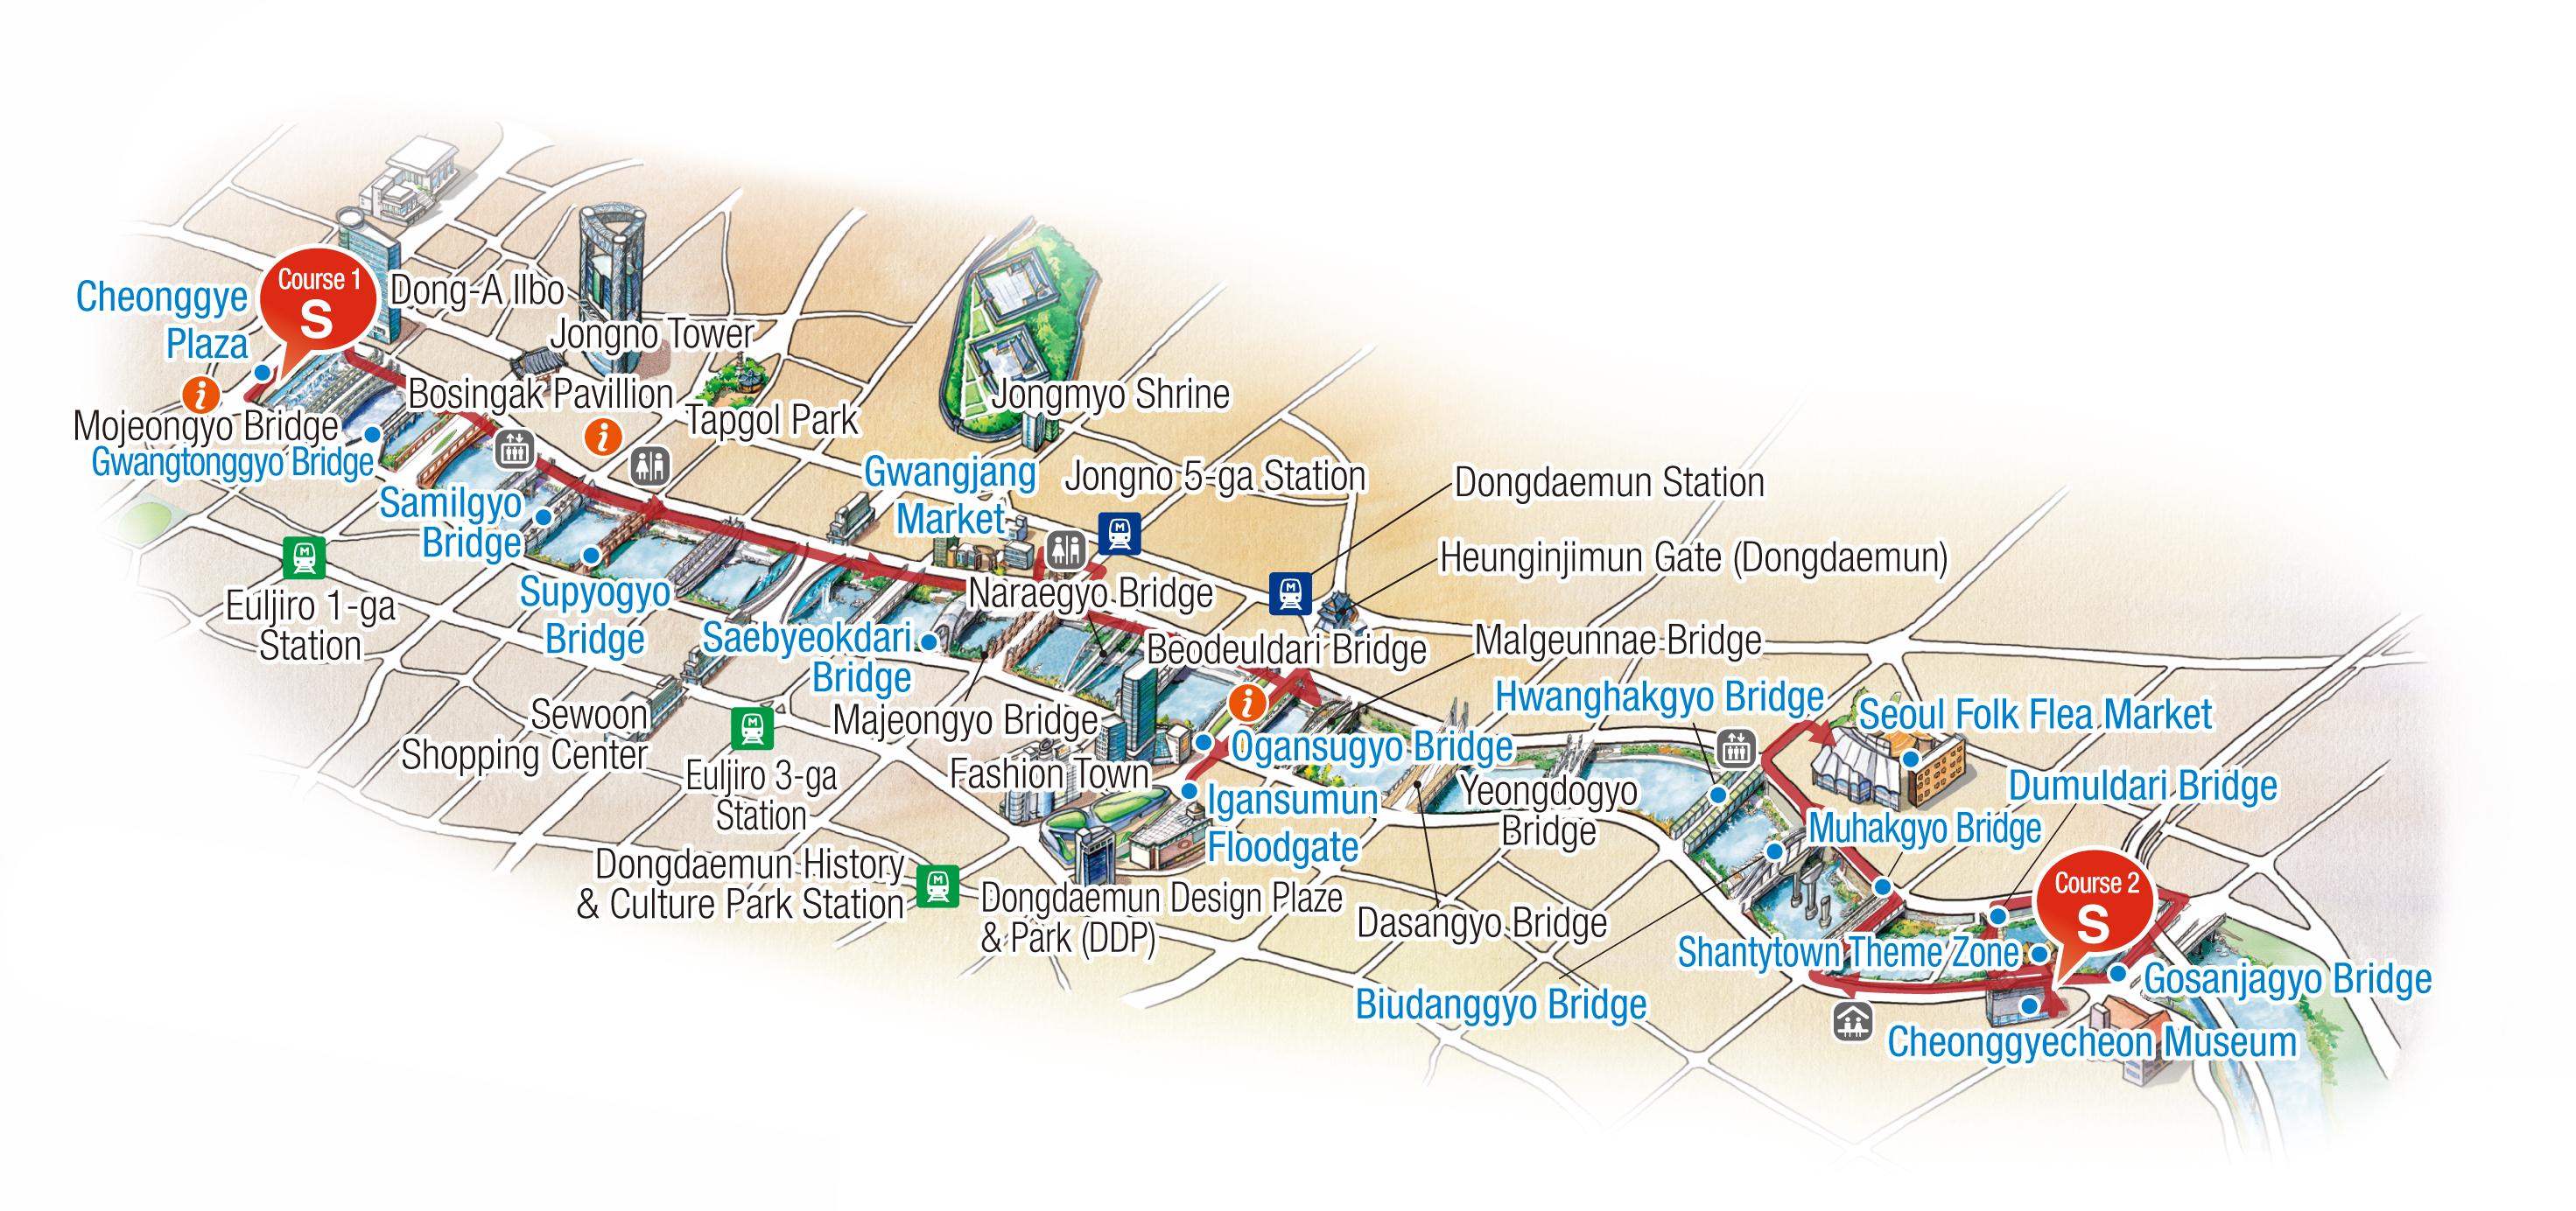 Map of Walking Tour Route : Cheonggye Plaza - Gwangtonggyo - Samilgyo - Supyogyo - Saebyeokdari - Gwangjang Market - Ogansugyo - Igansmumun Floodgate